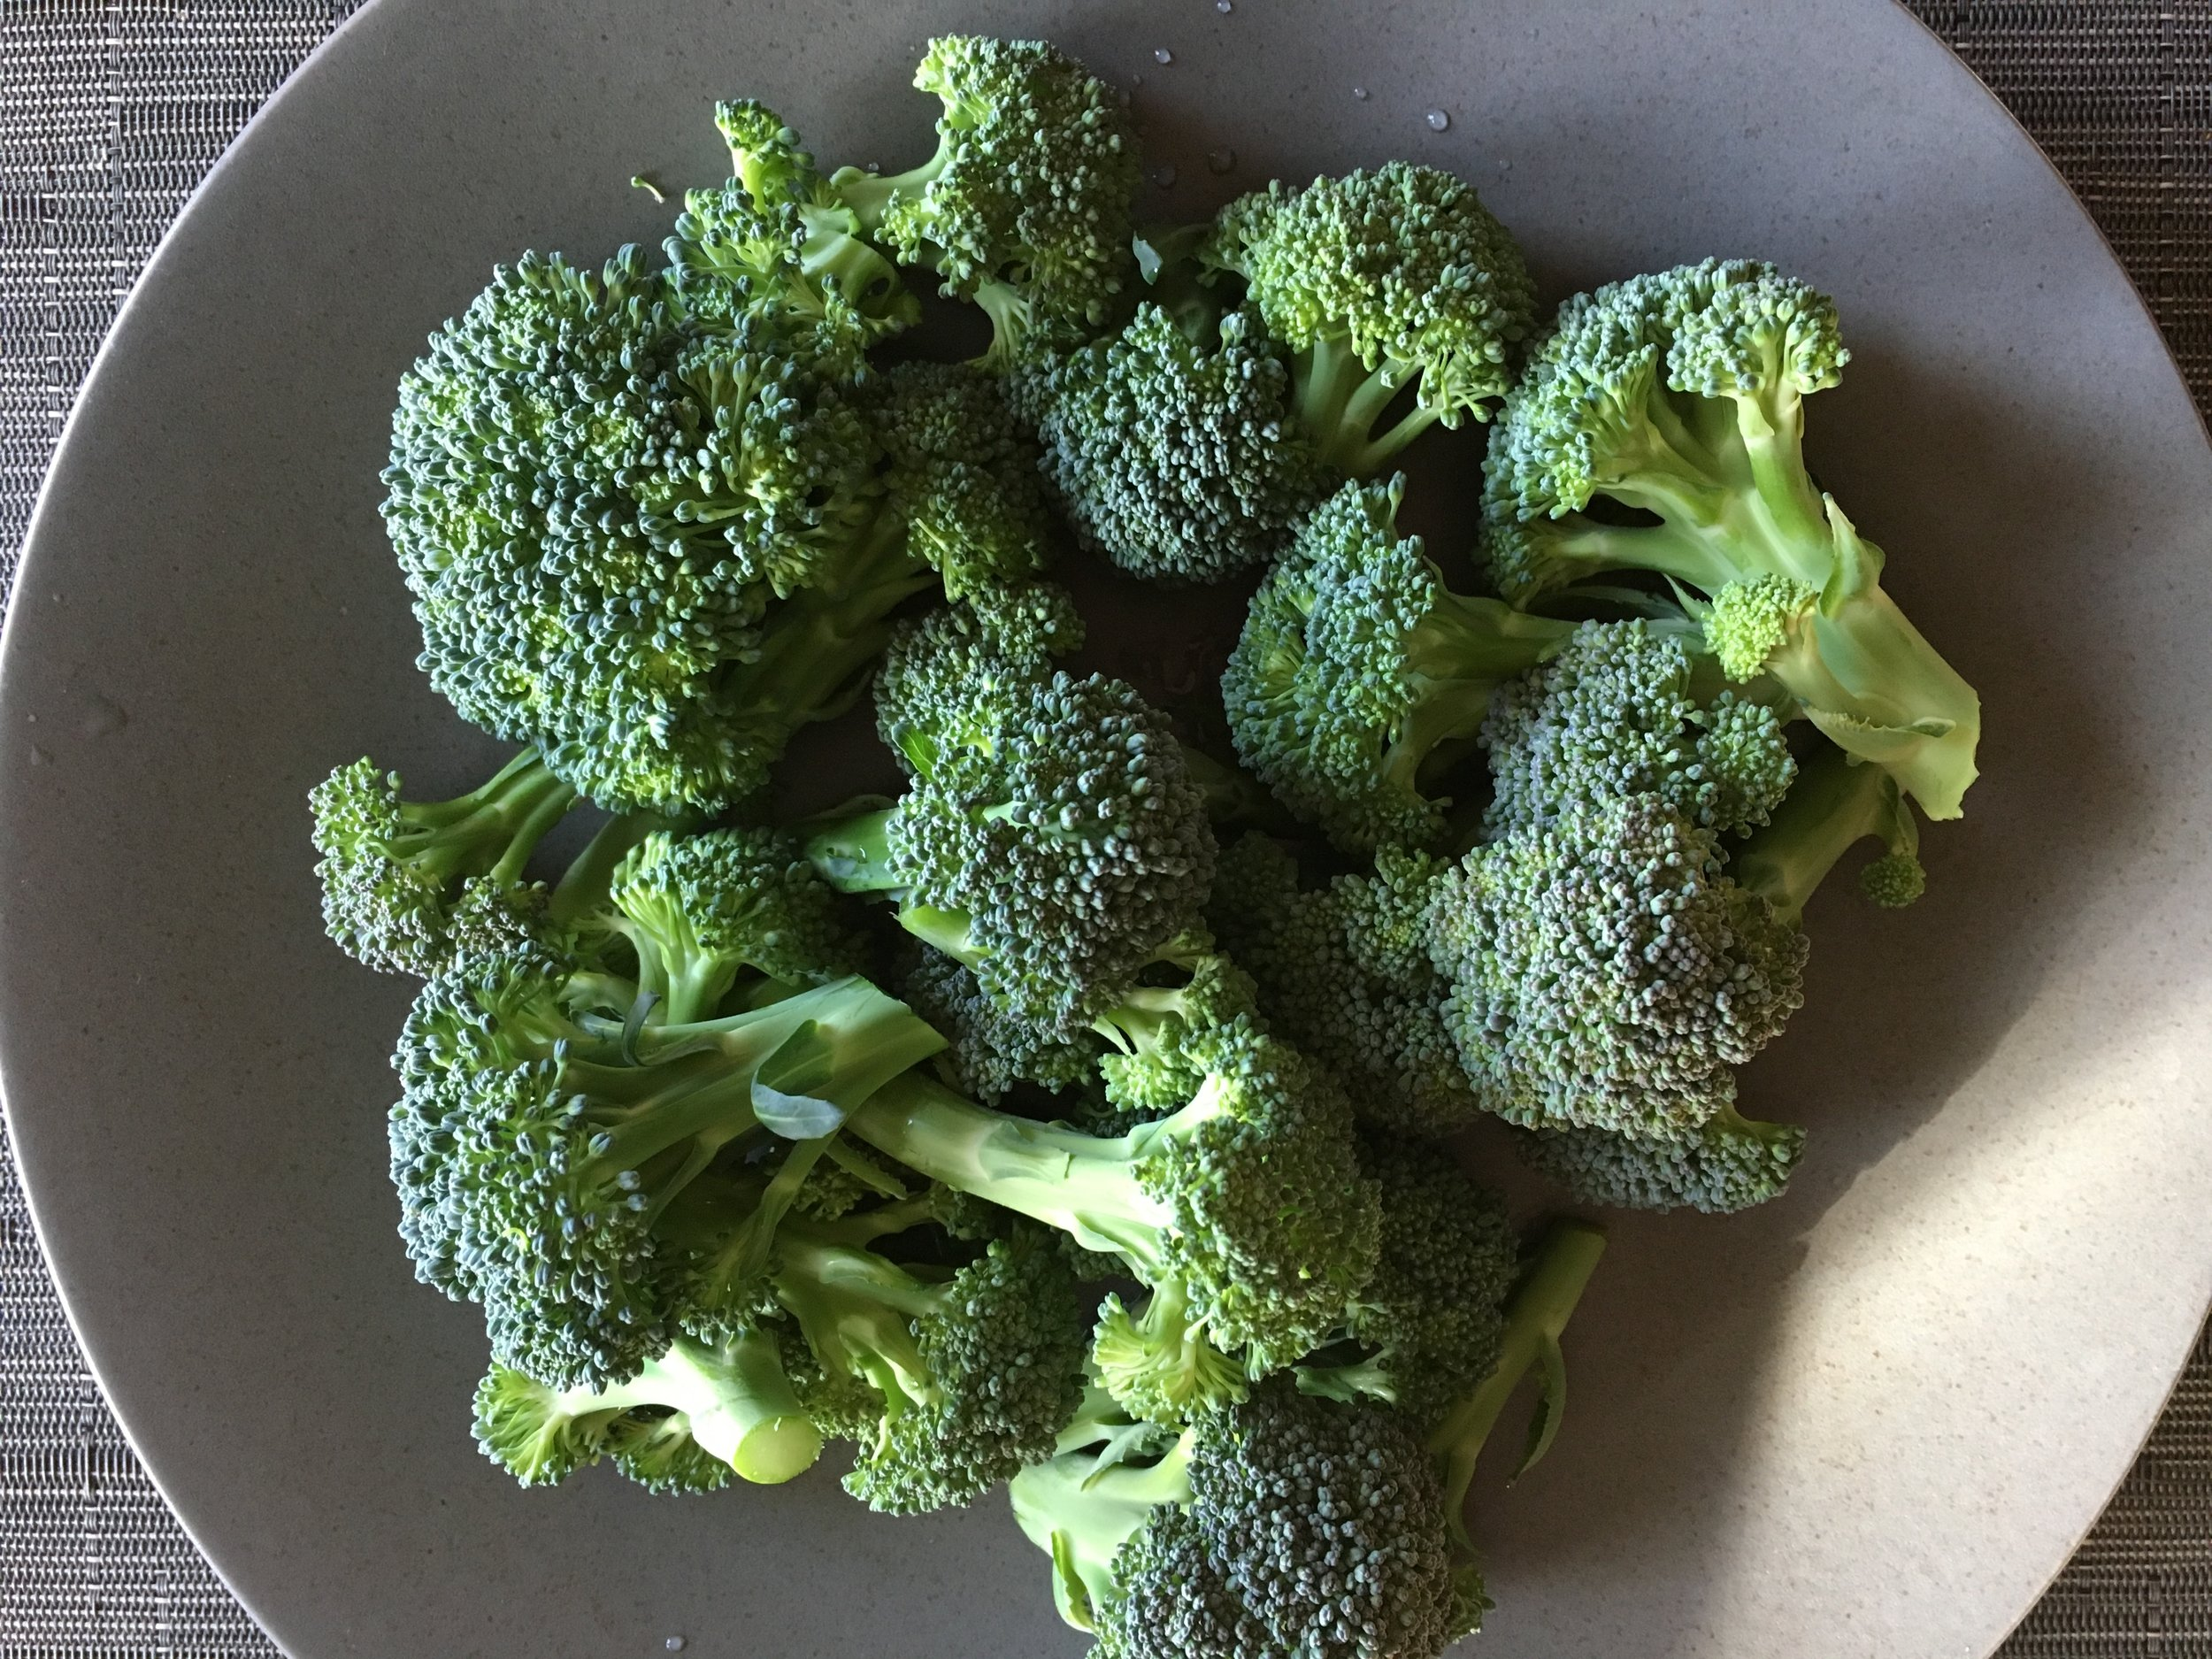 Broccoli 91% water